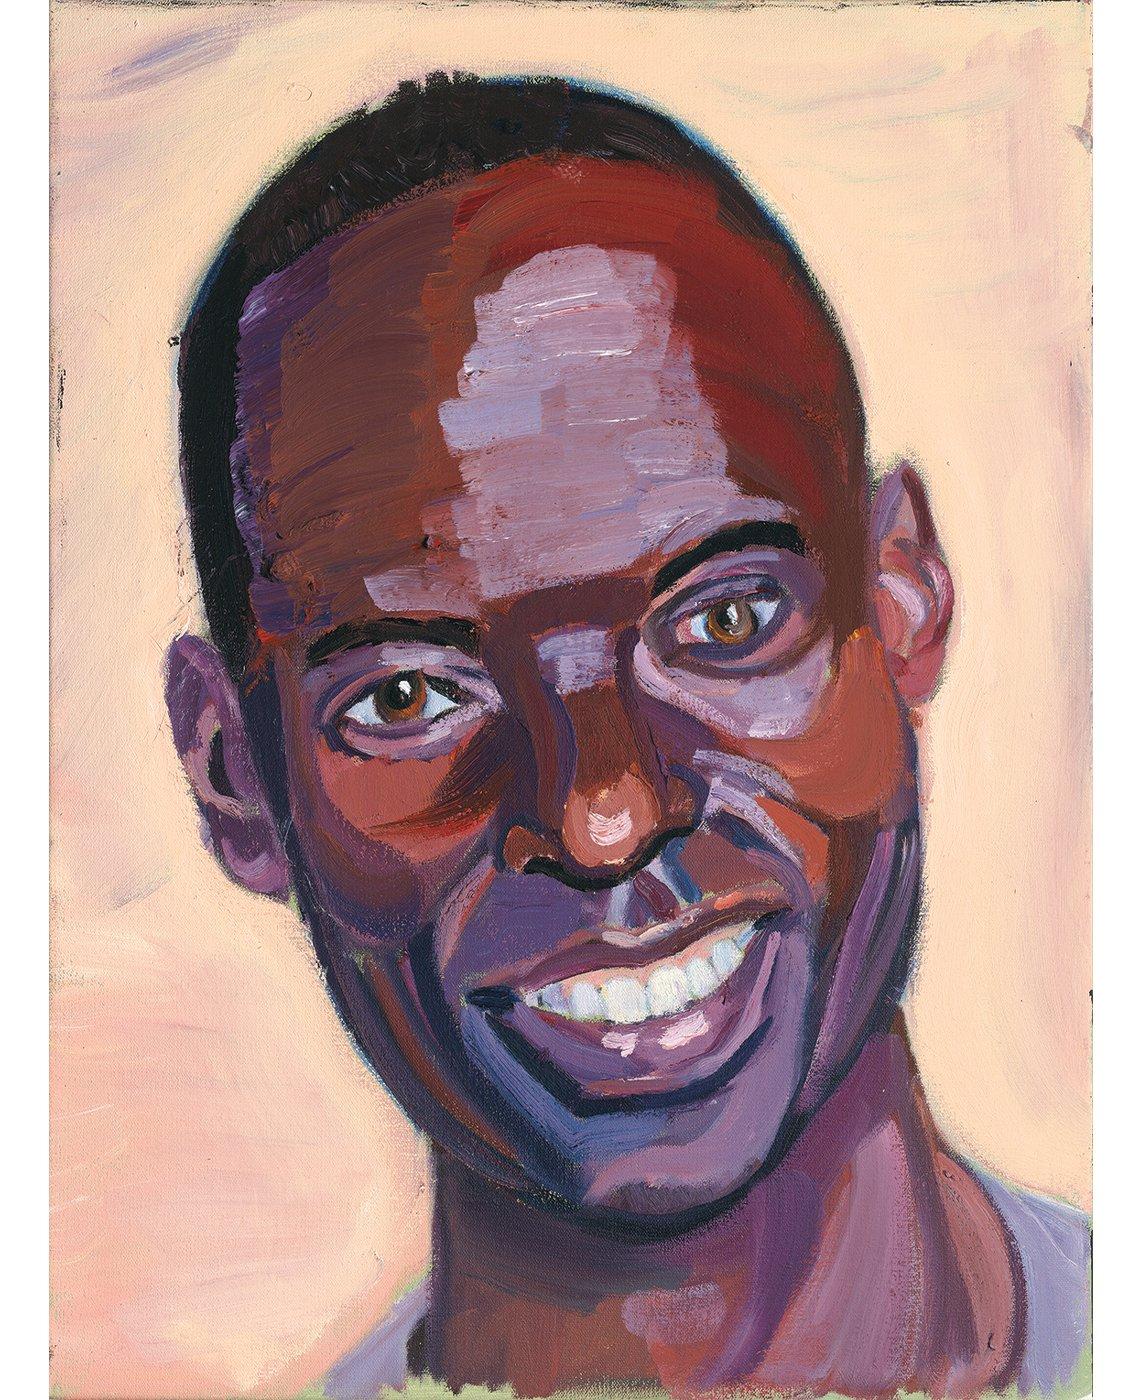 Retrato de Gilbert Tuhabonye, por George W. Bush.